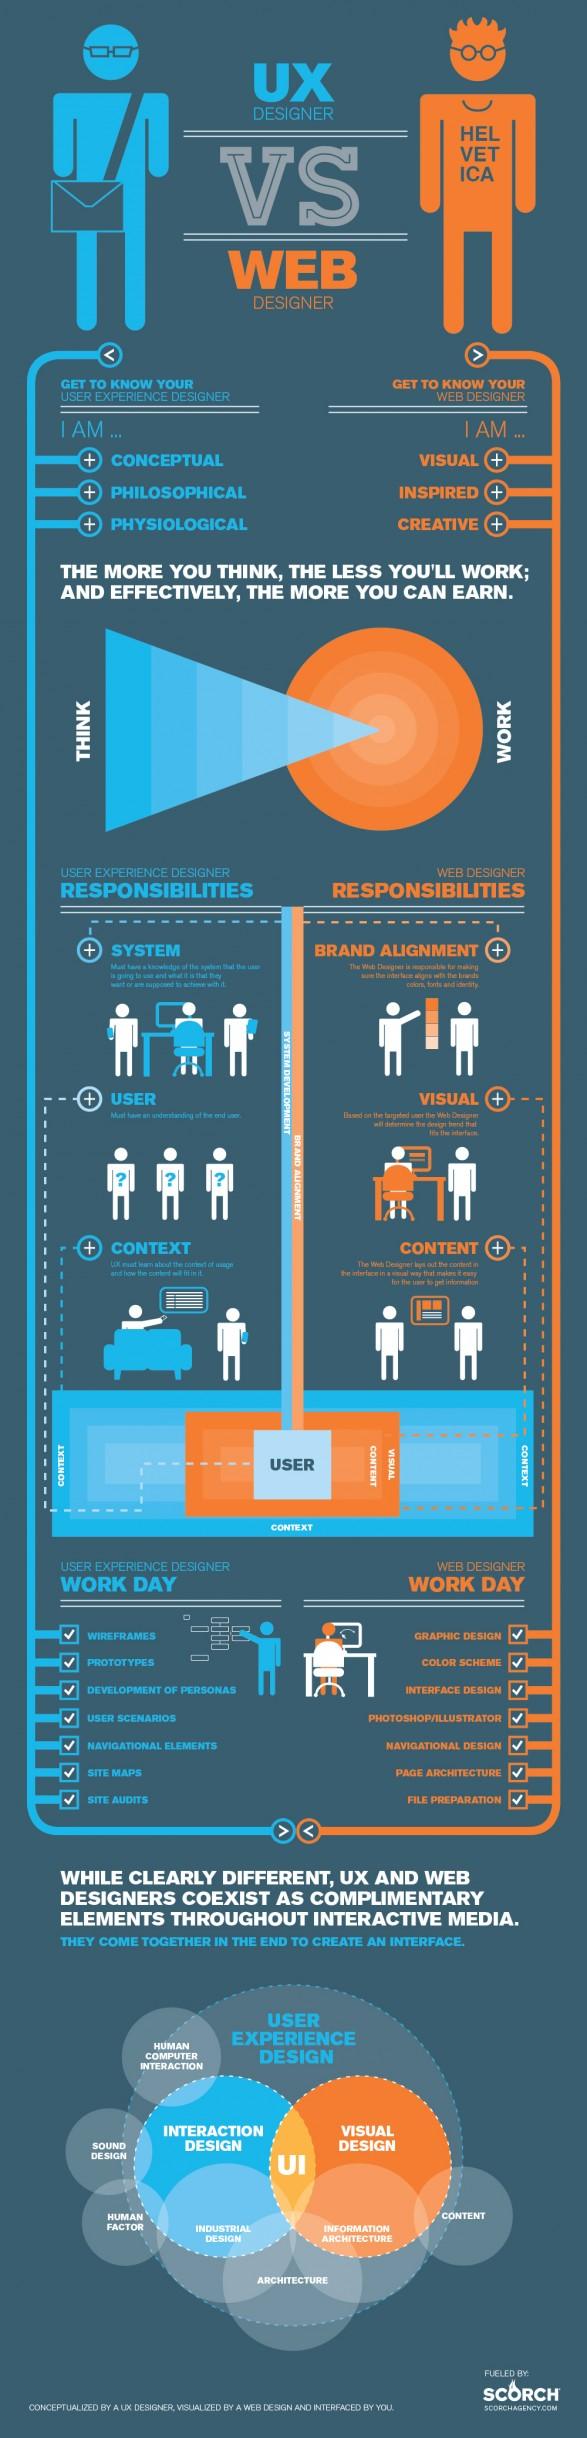 UX designer vs. web designer